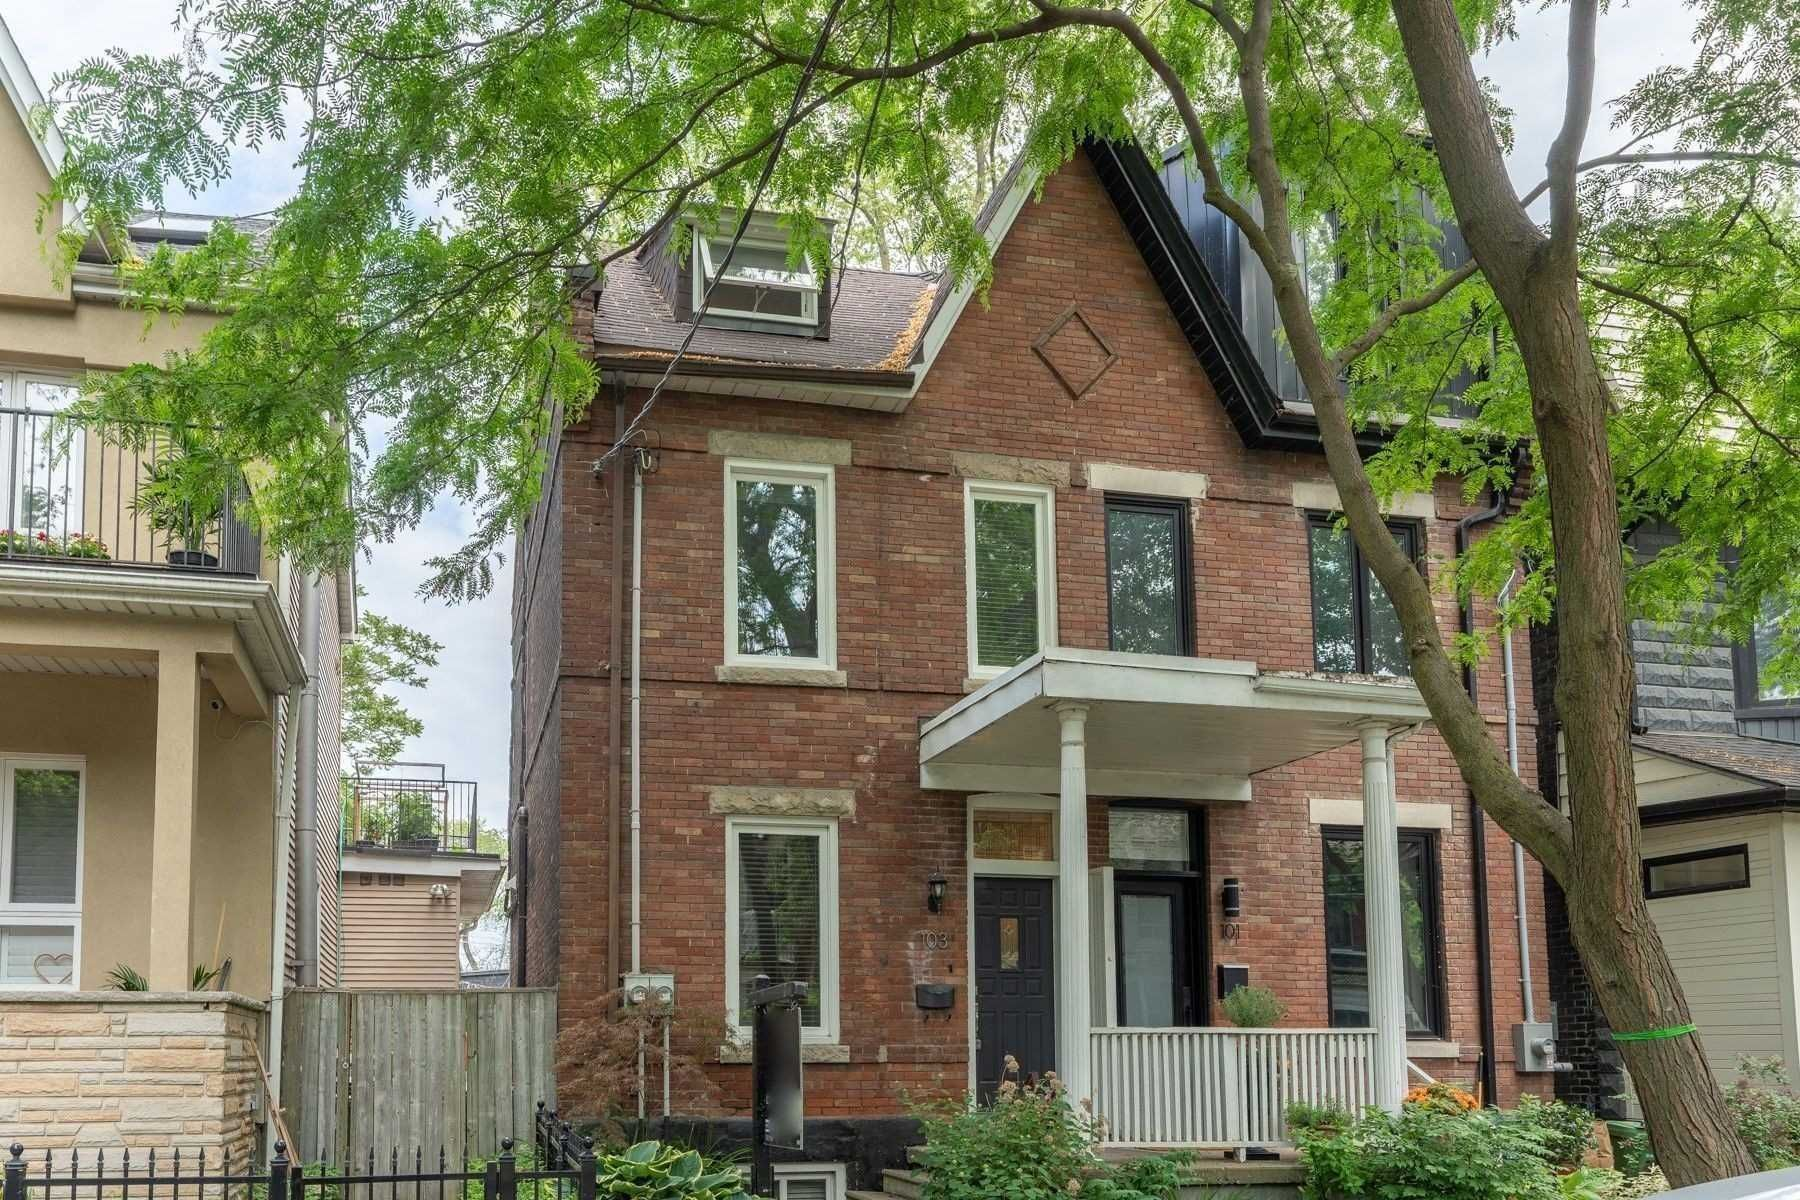 Main Photo: 103 Morse Street in Toronto: South Riverdale House (2 1/2 Storey) for lease (Toronto E01)  : MLS®# E5312667